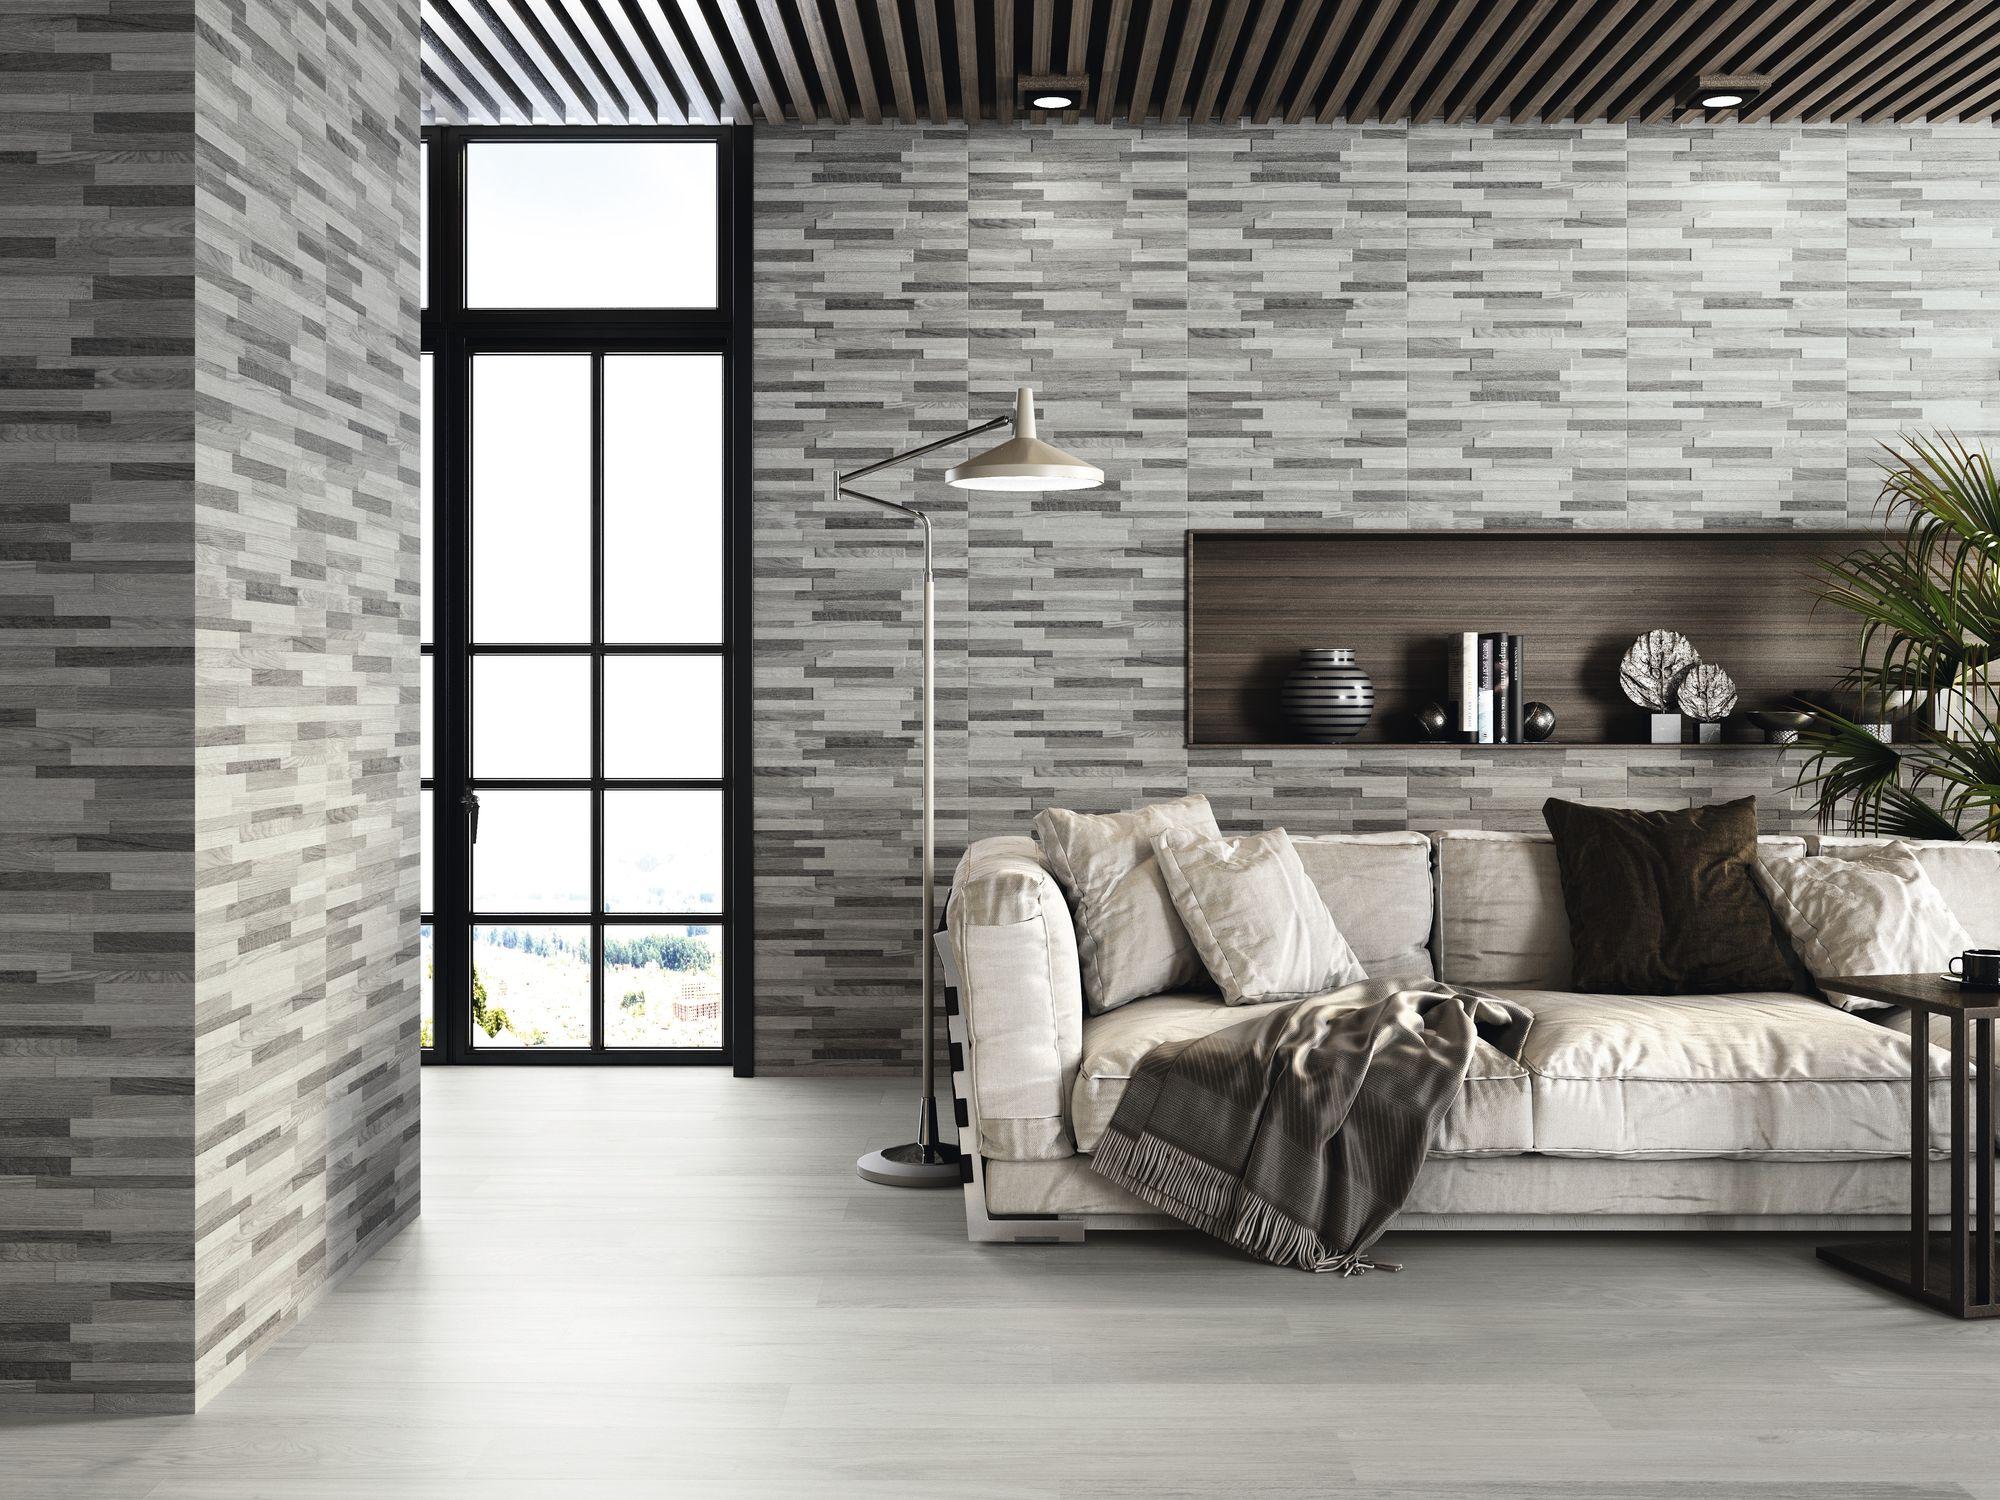 Brickwood Otawa Winter 30x60 cm. Pavimento Otawa Ceniza 20x120 cm.